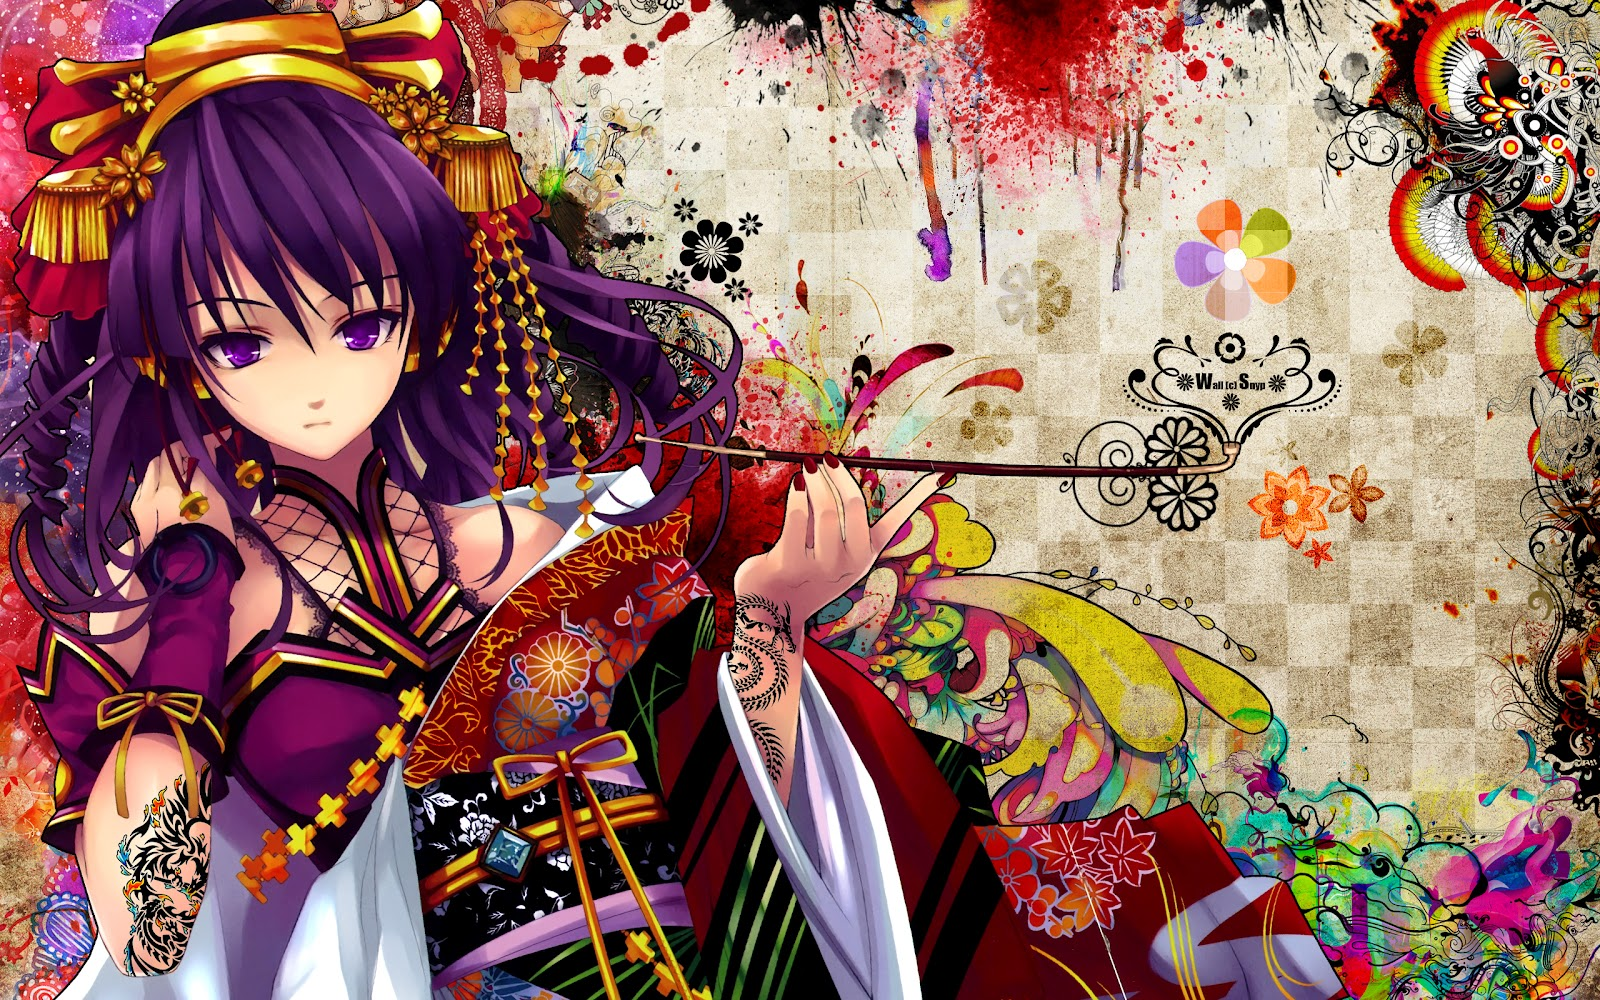 geisha hd wallpapers geisha hd wallpapers geisha hd wallpapers geisha 1600x1000